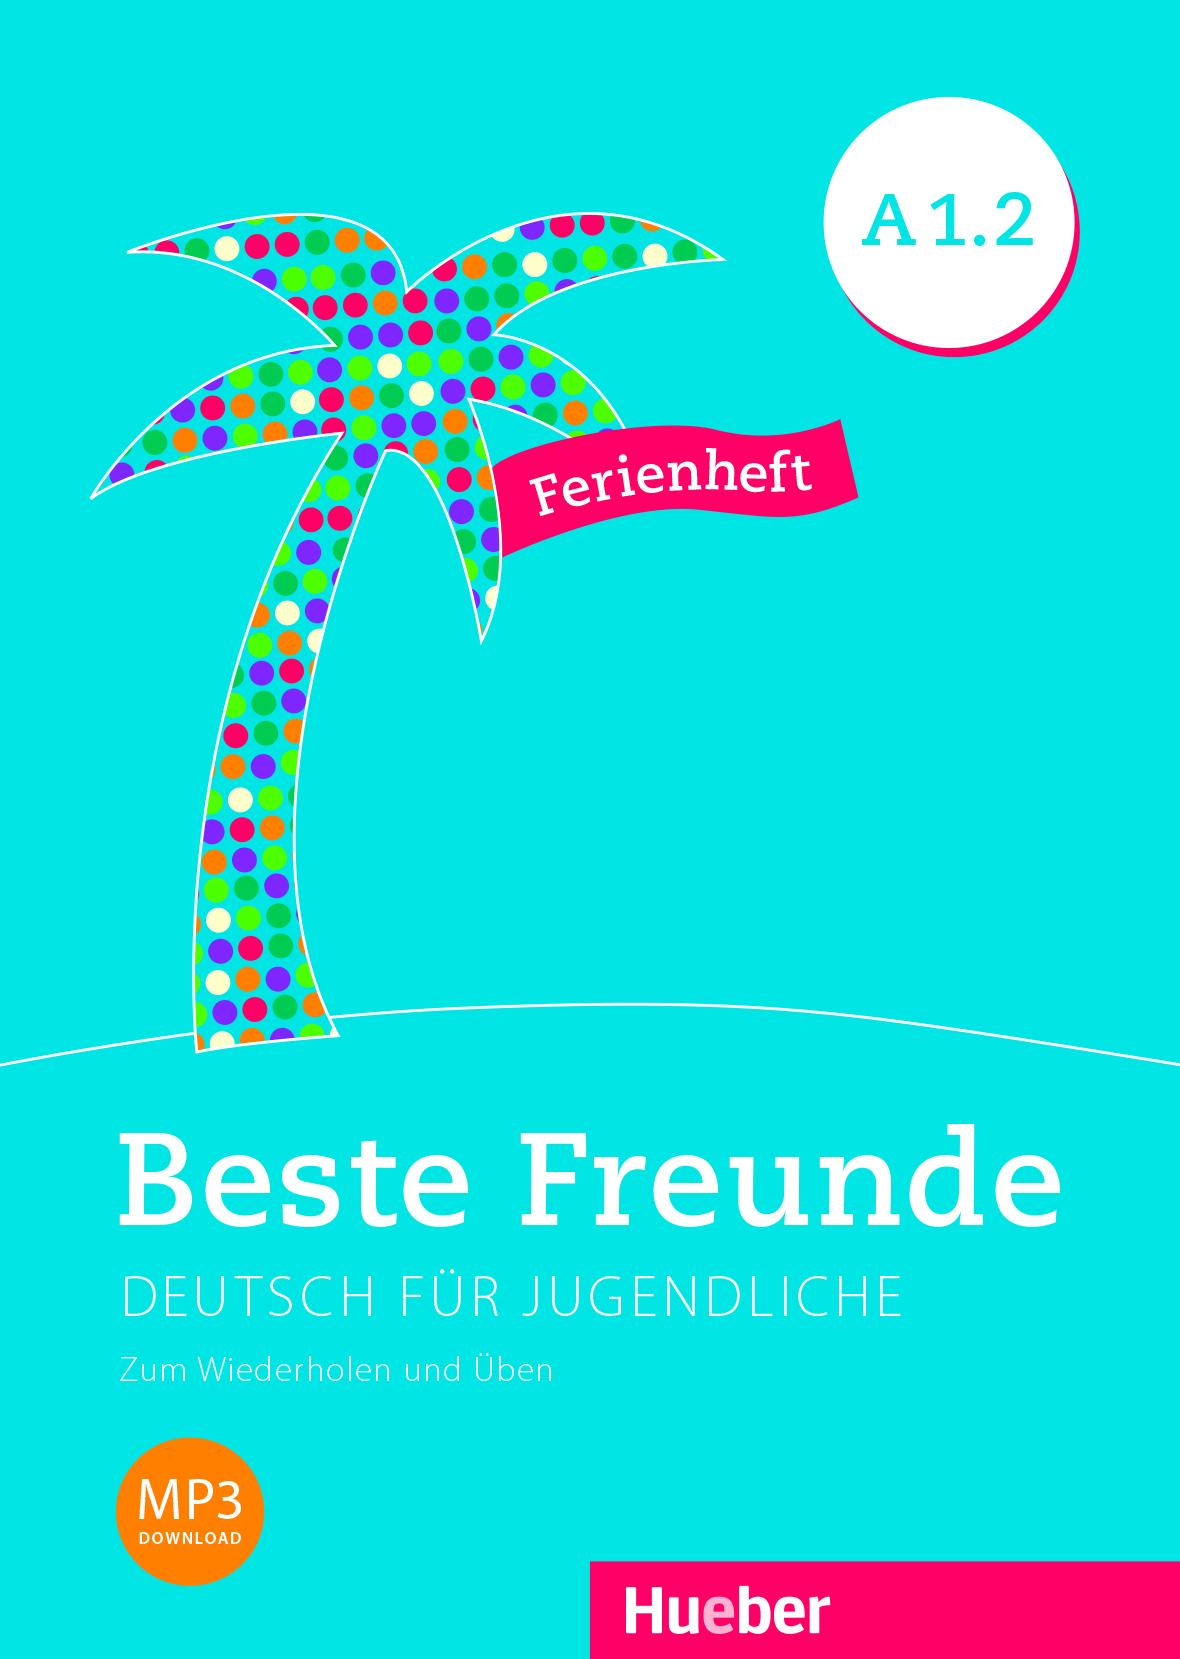 BesteFreunde12-Ferienheft